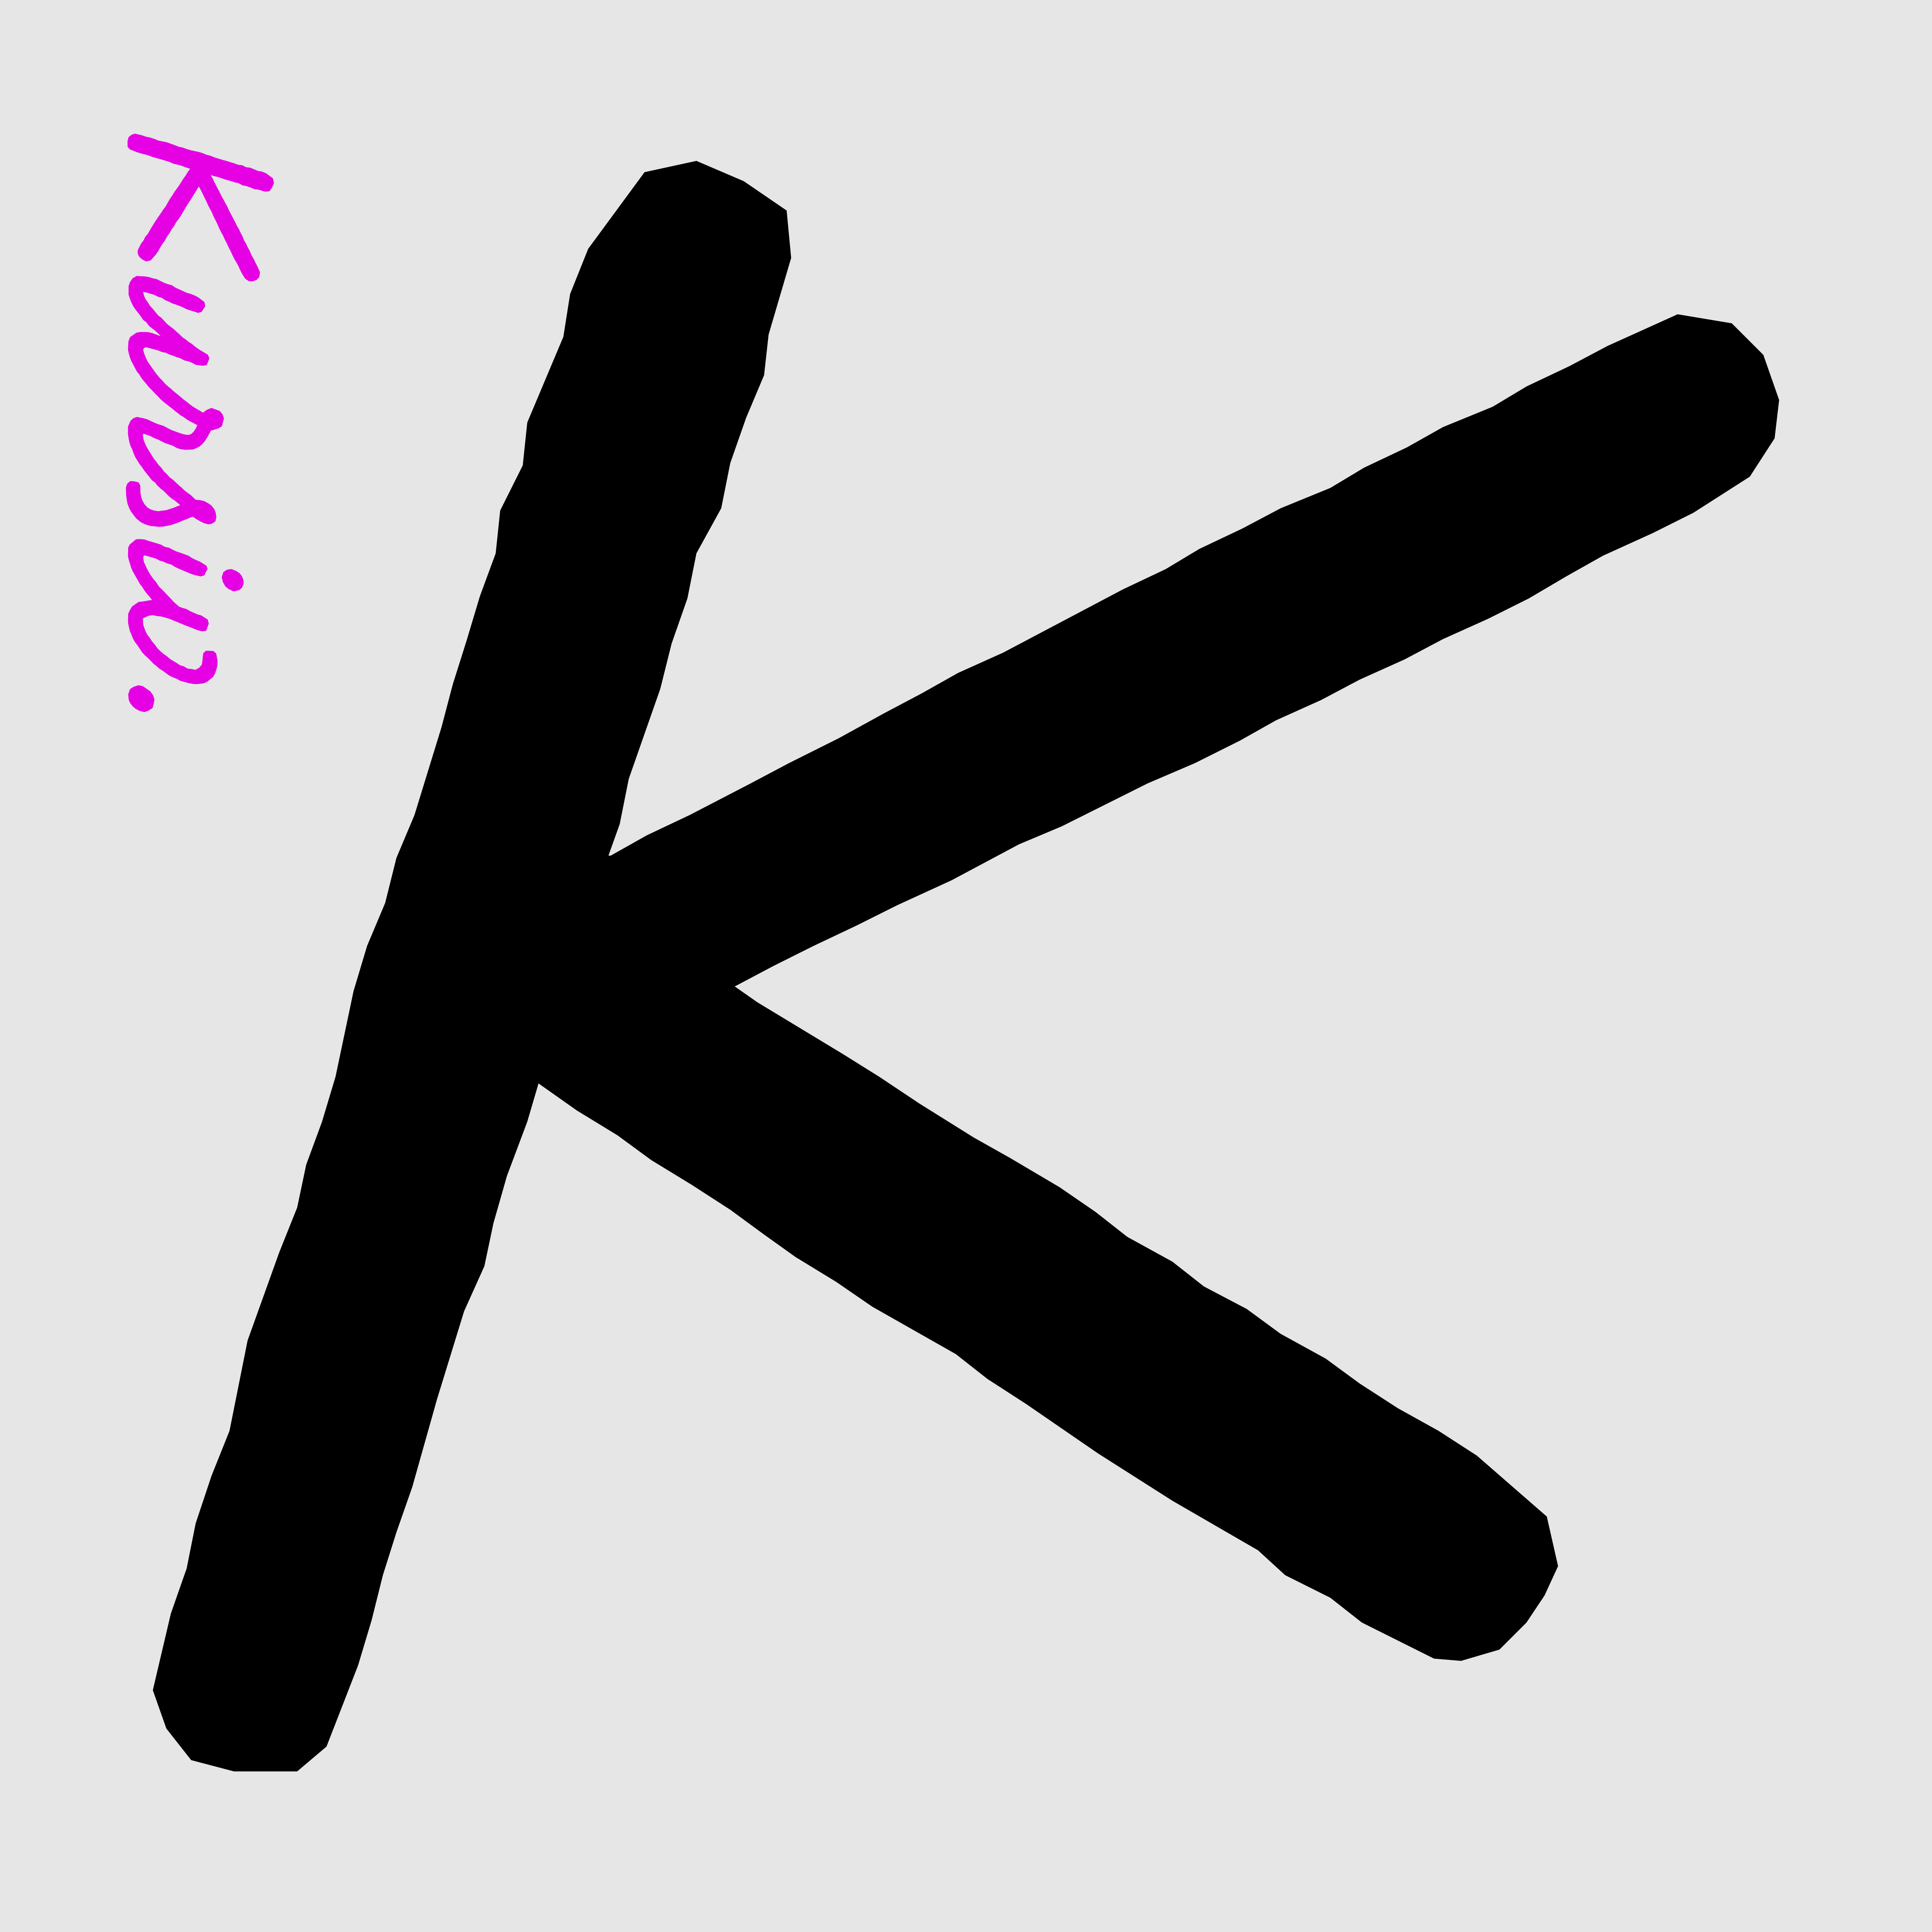 Kursiv sample